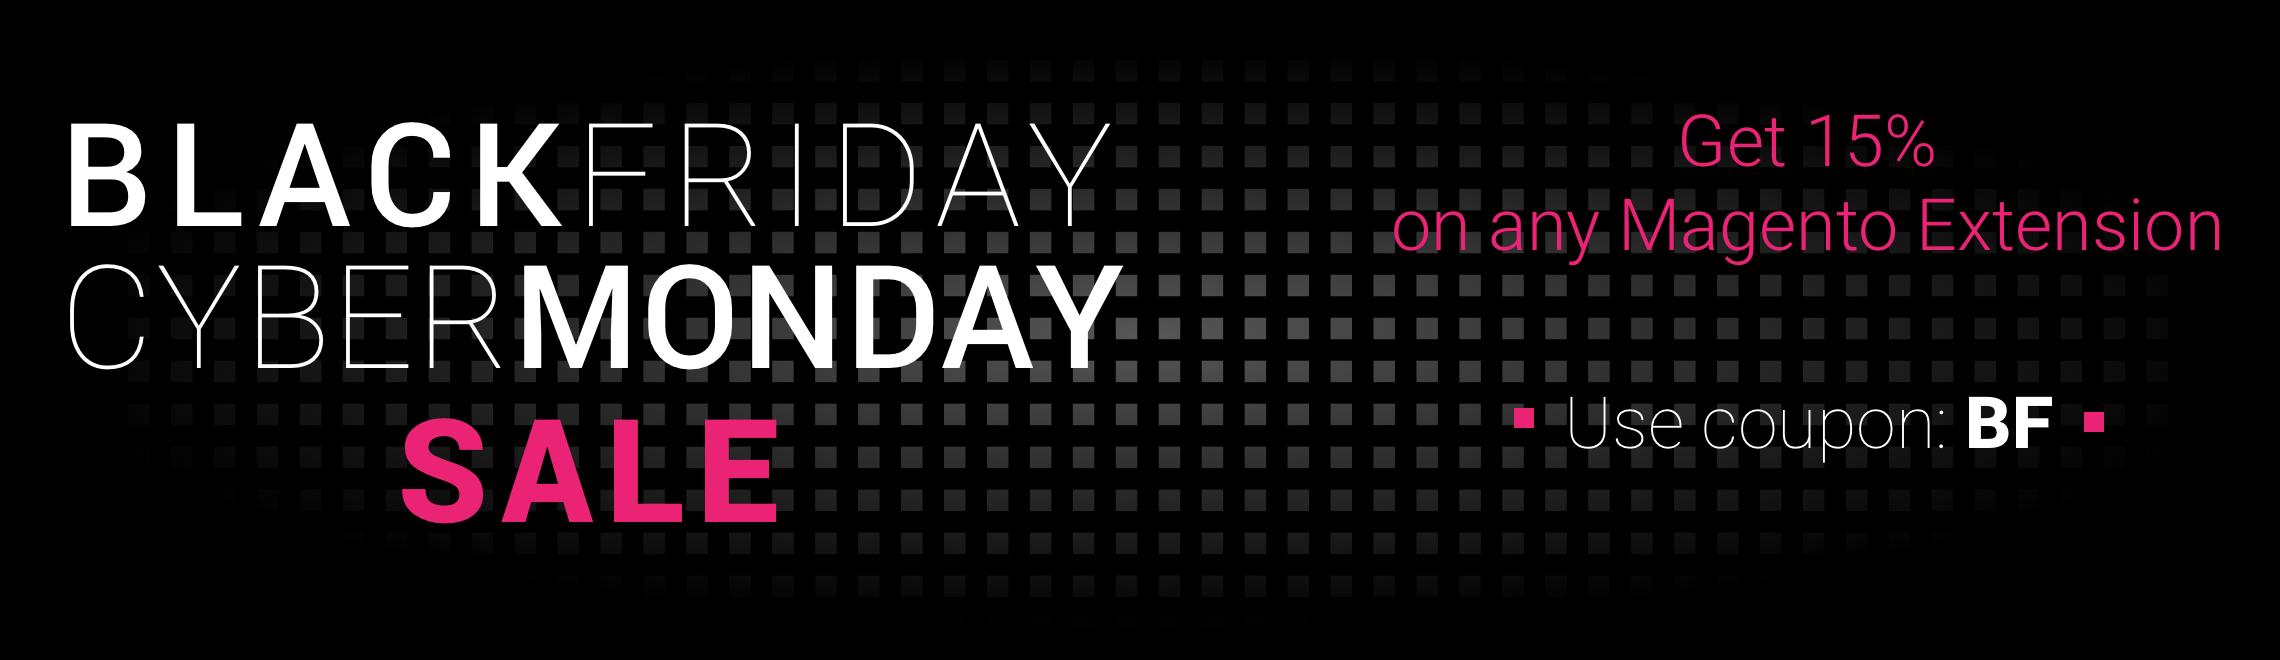 Black Friday & Cyber Monday Deals 2016